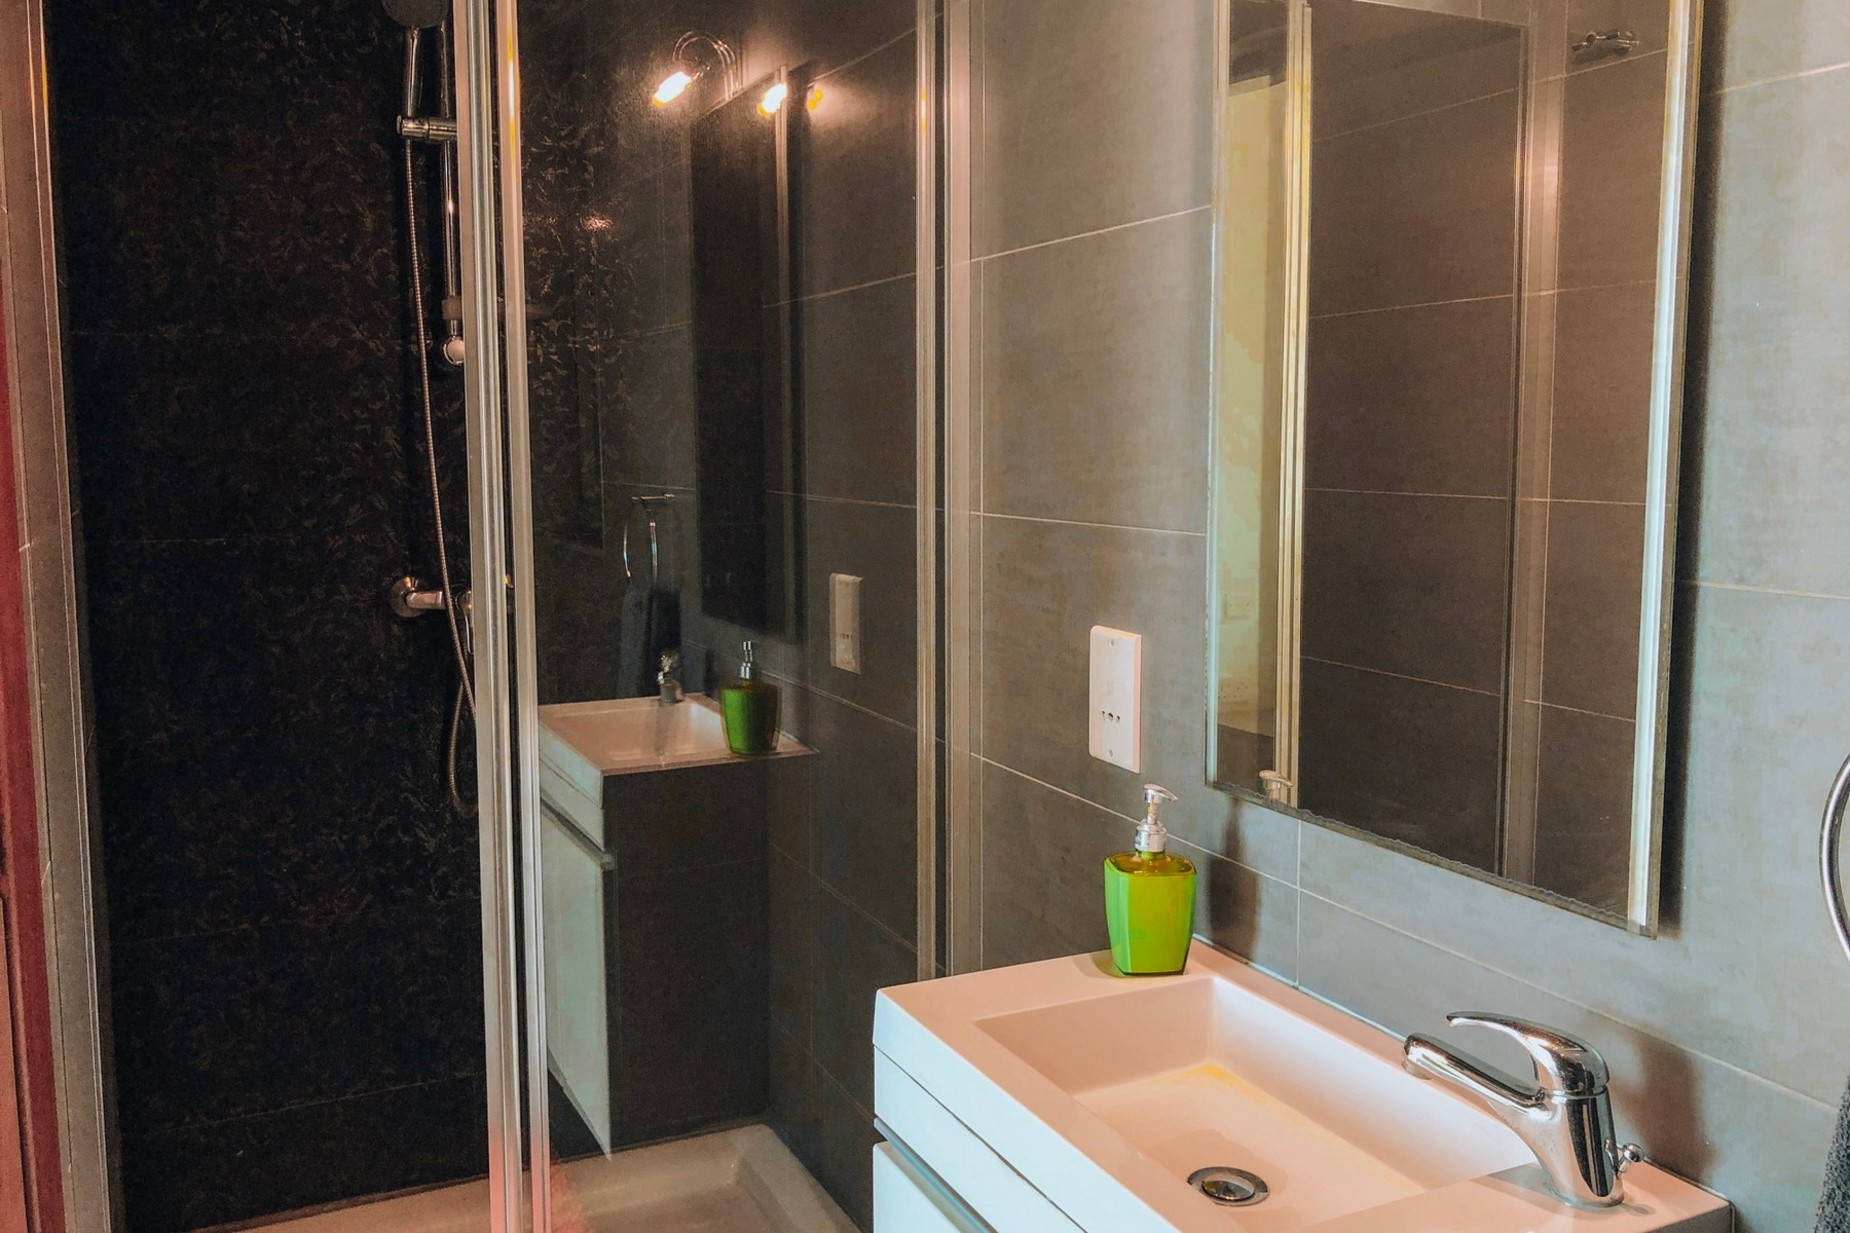 3 bed Apartment For Rent in Balzan, Balzan - thumb 7